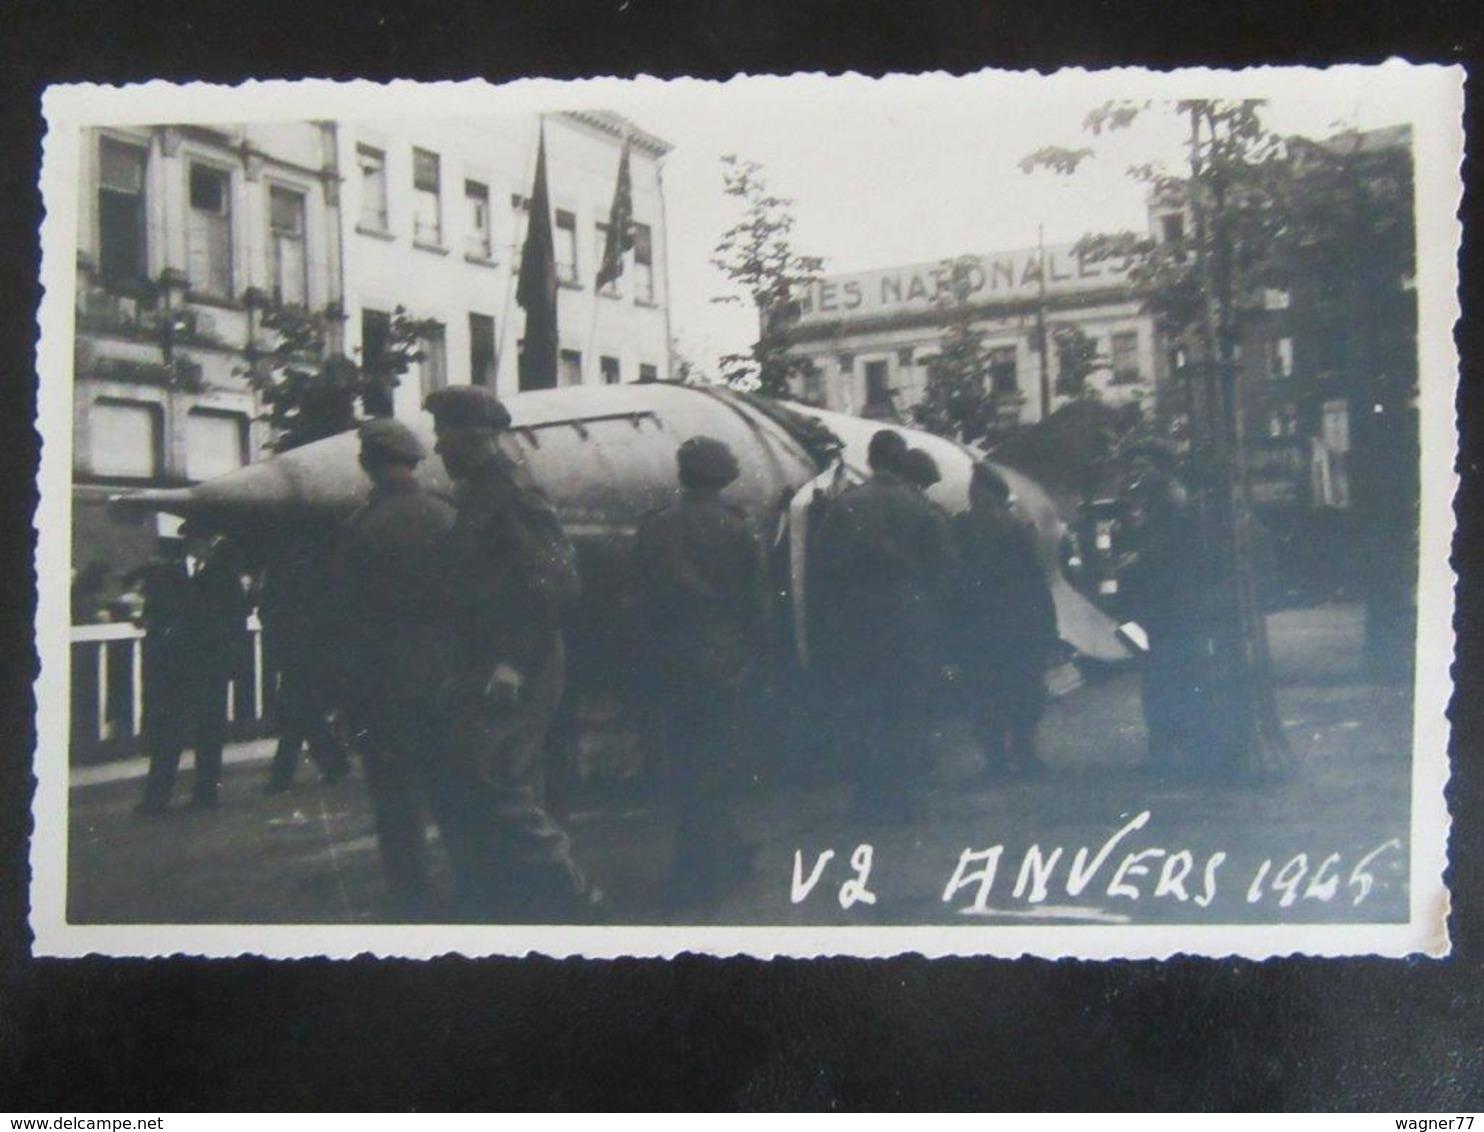 Fotokarte V2 Vliegende Bom - Raket - Antwerpen / Anvers 1945 - Weltkrieg 1939-45